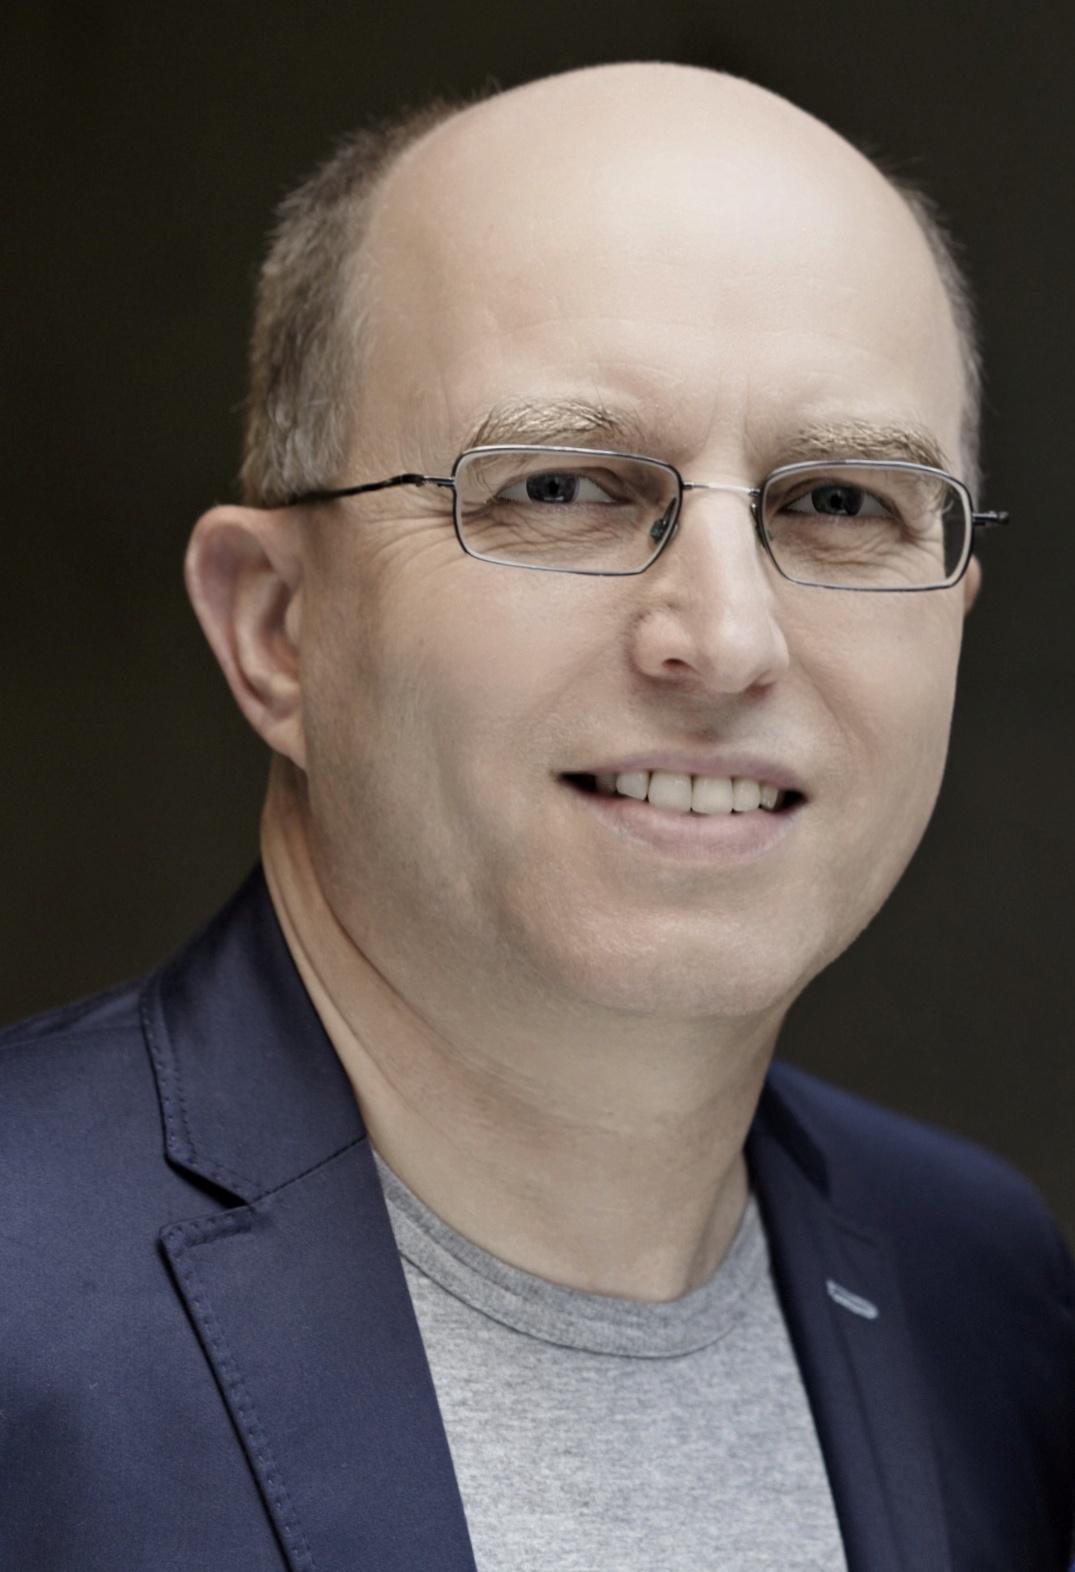 Vladimir Rydl